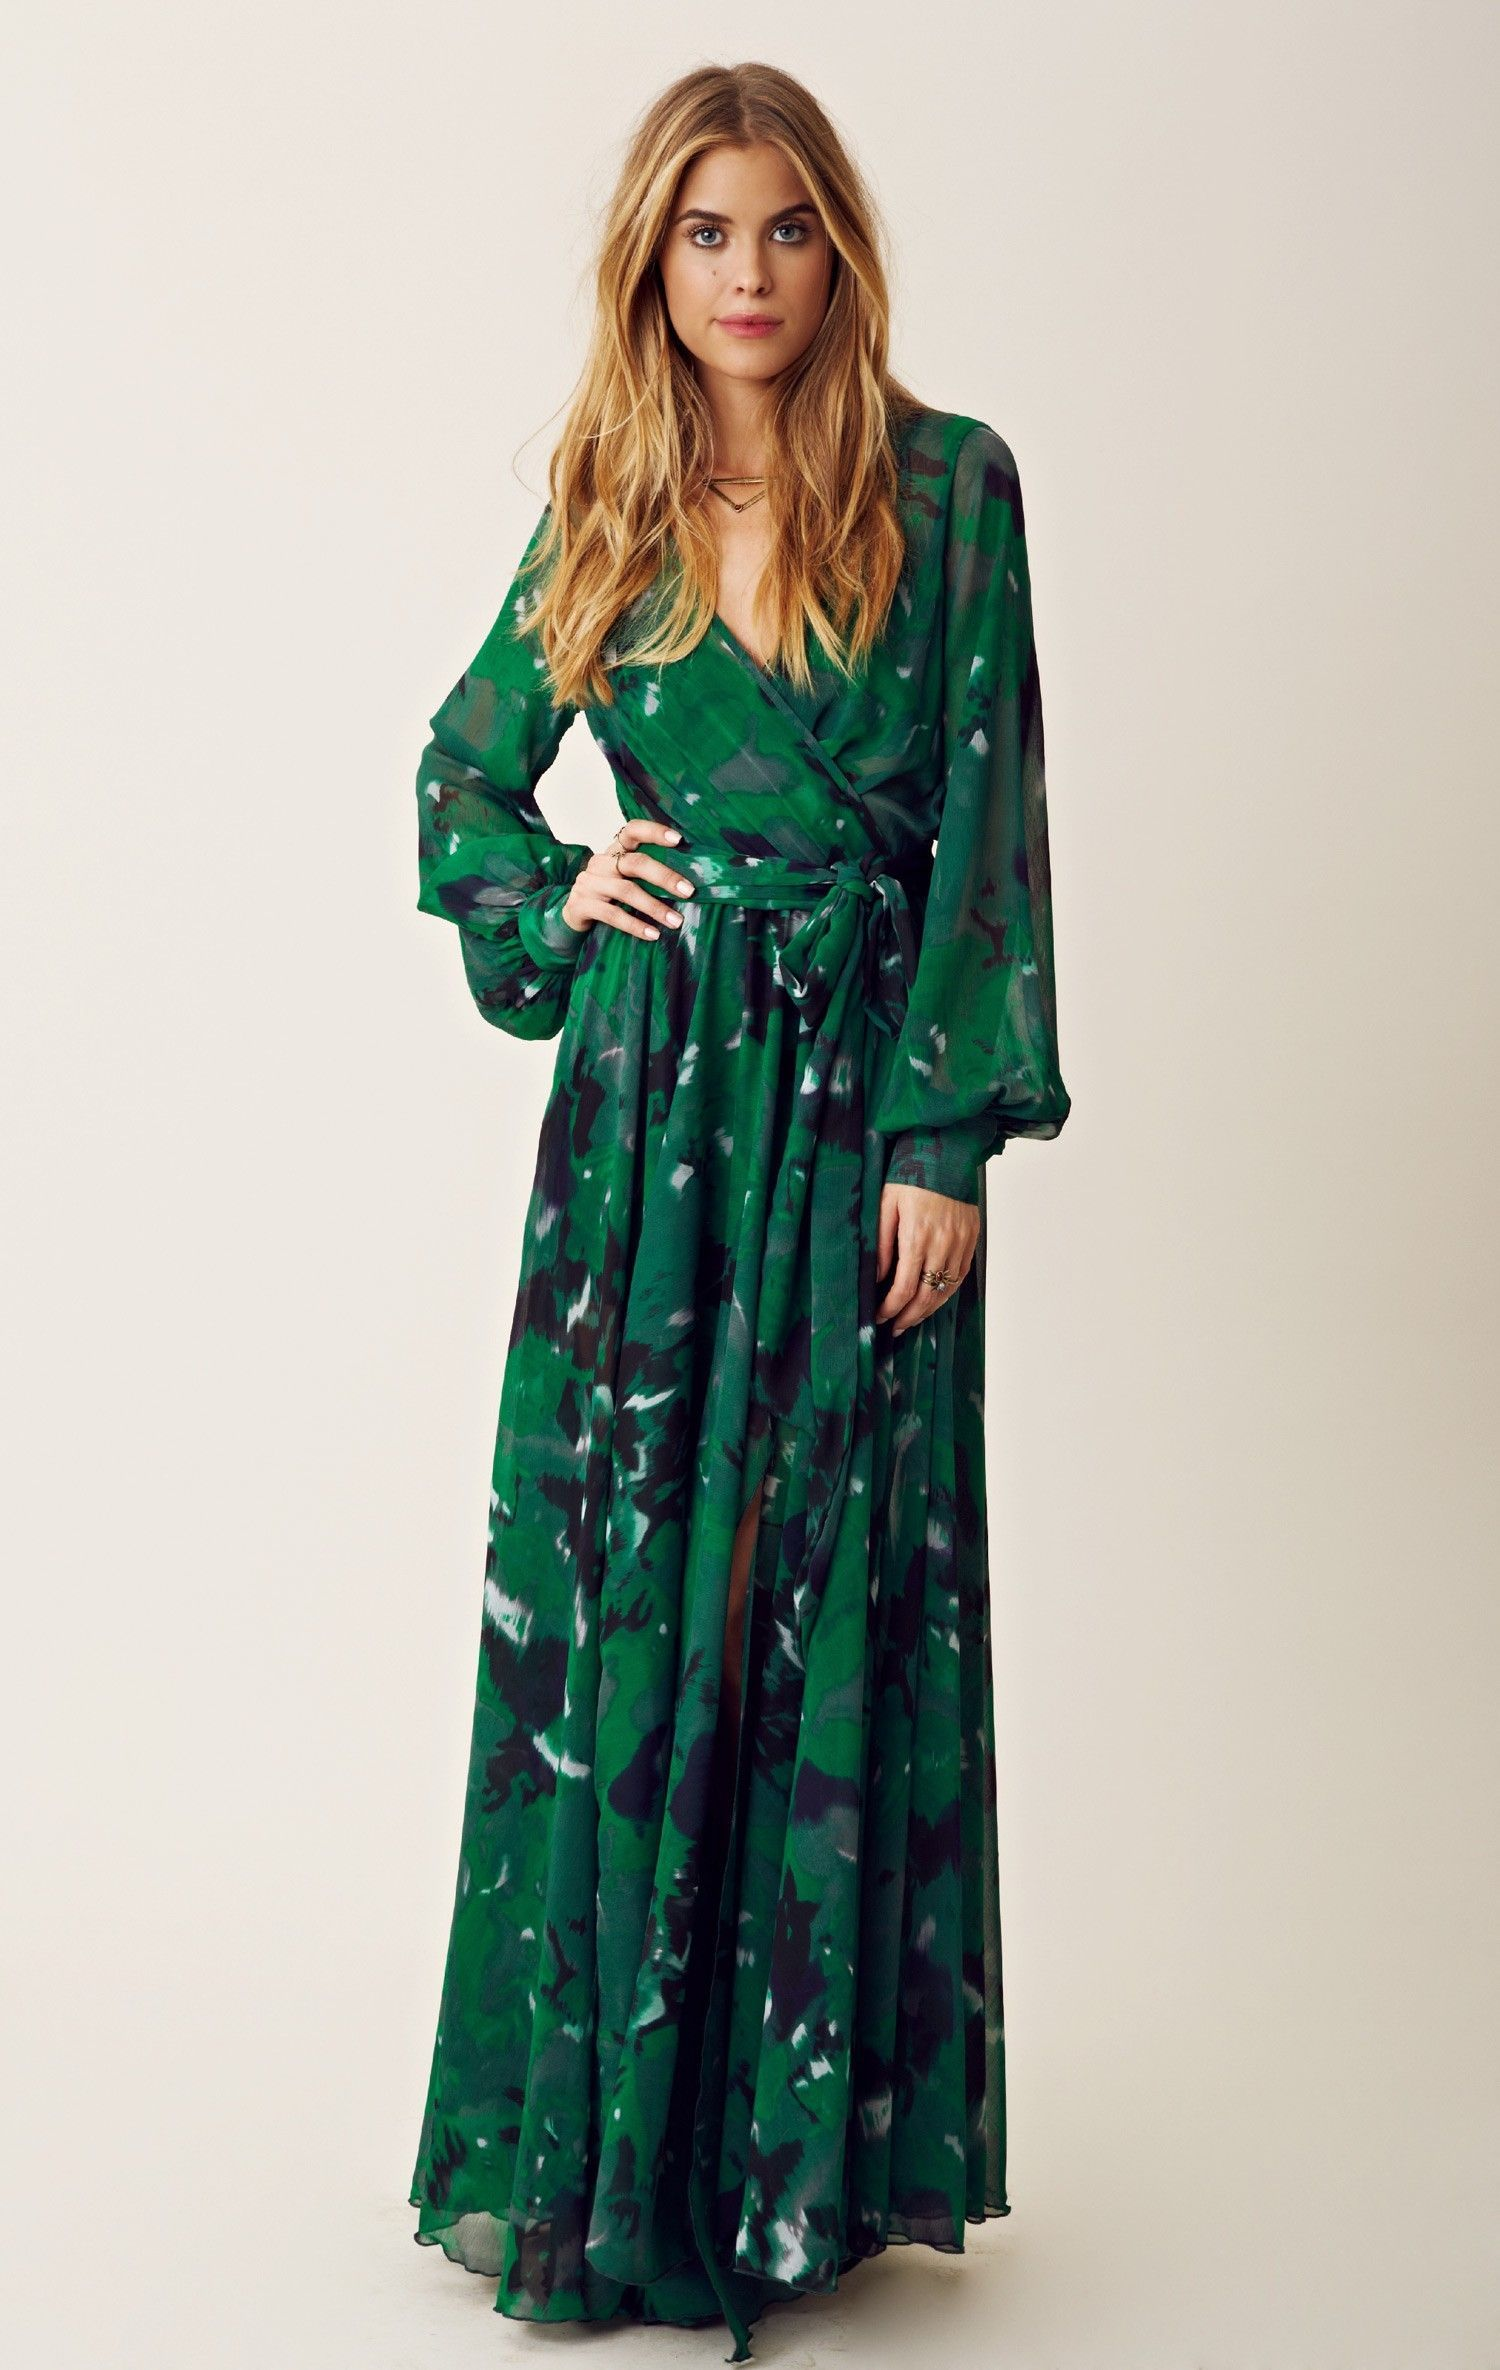 Blu moon us style slit dress maxi dresses summer pinterest